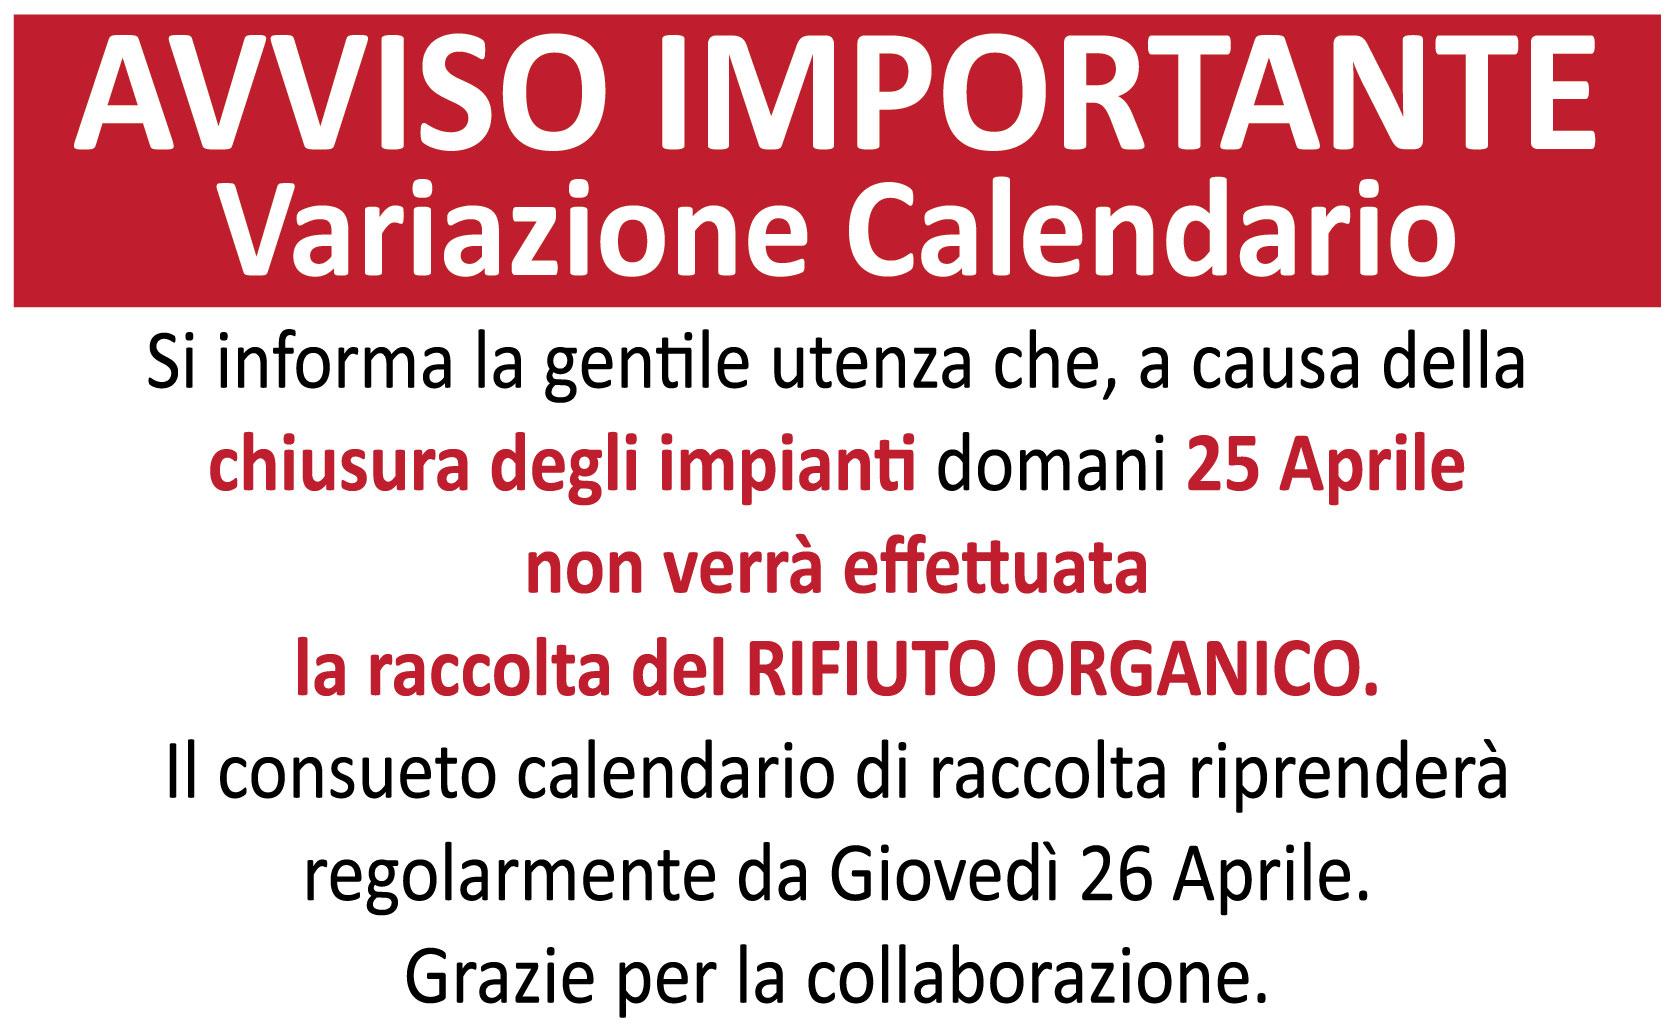 avviso variazione calendario di raccolta